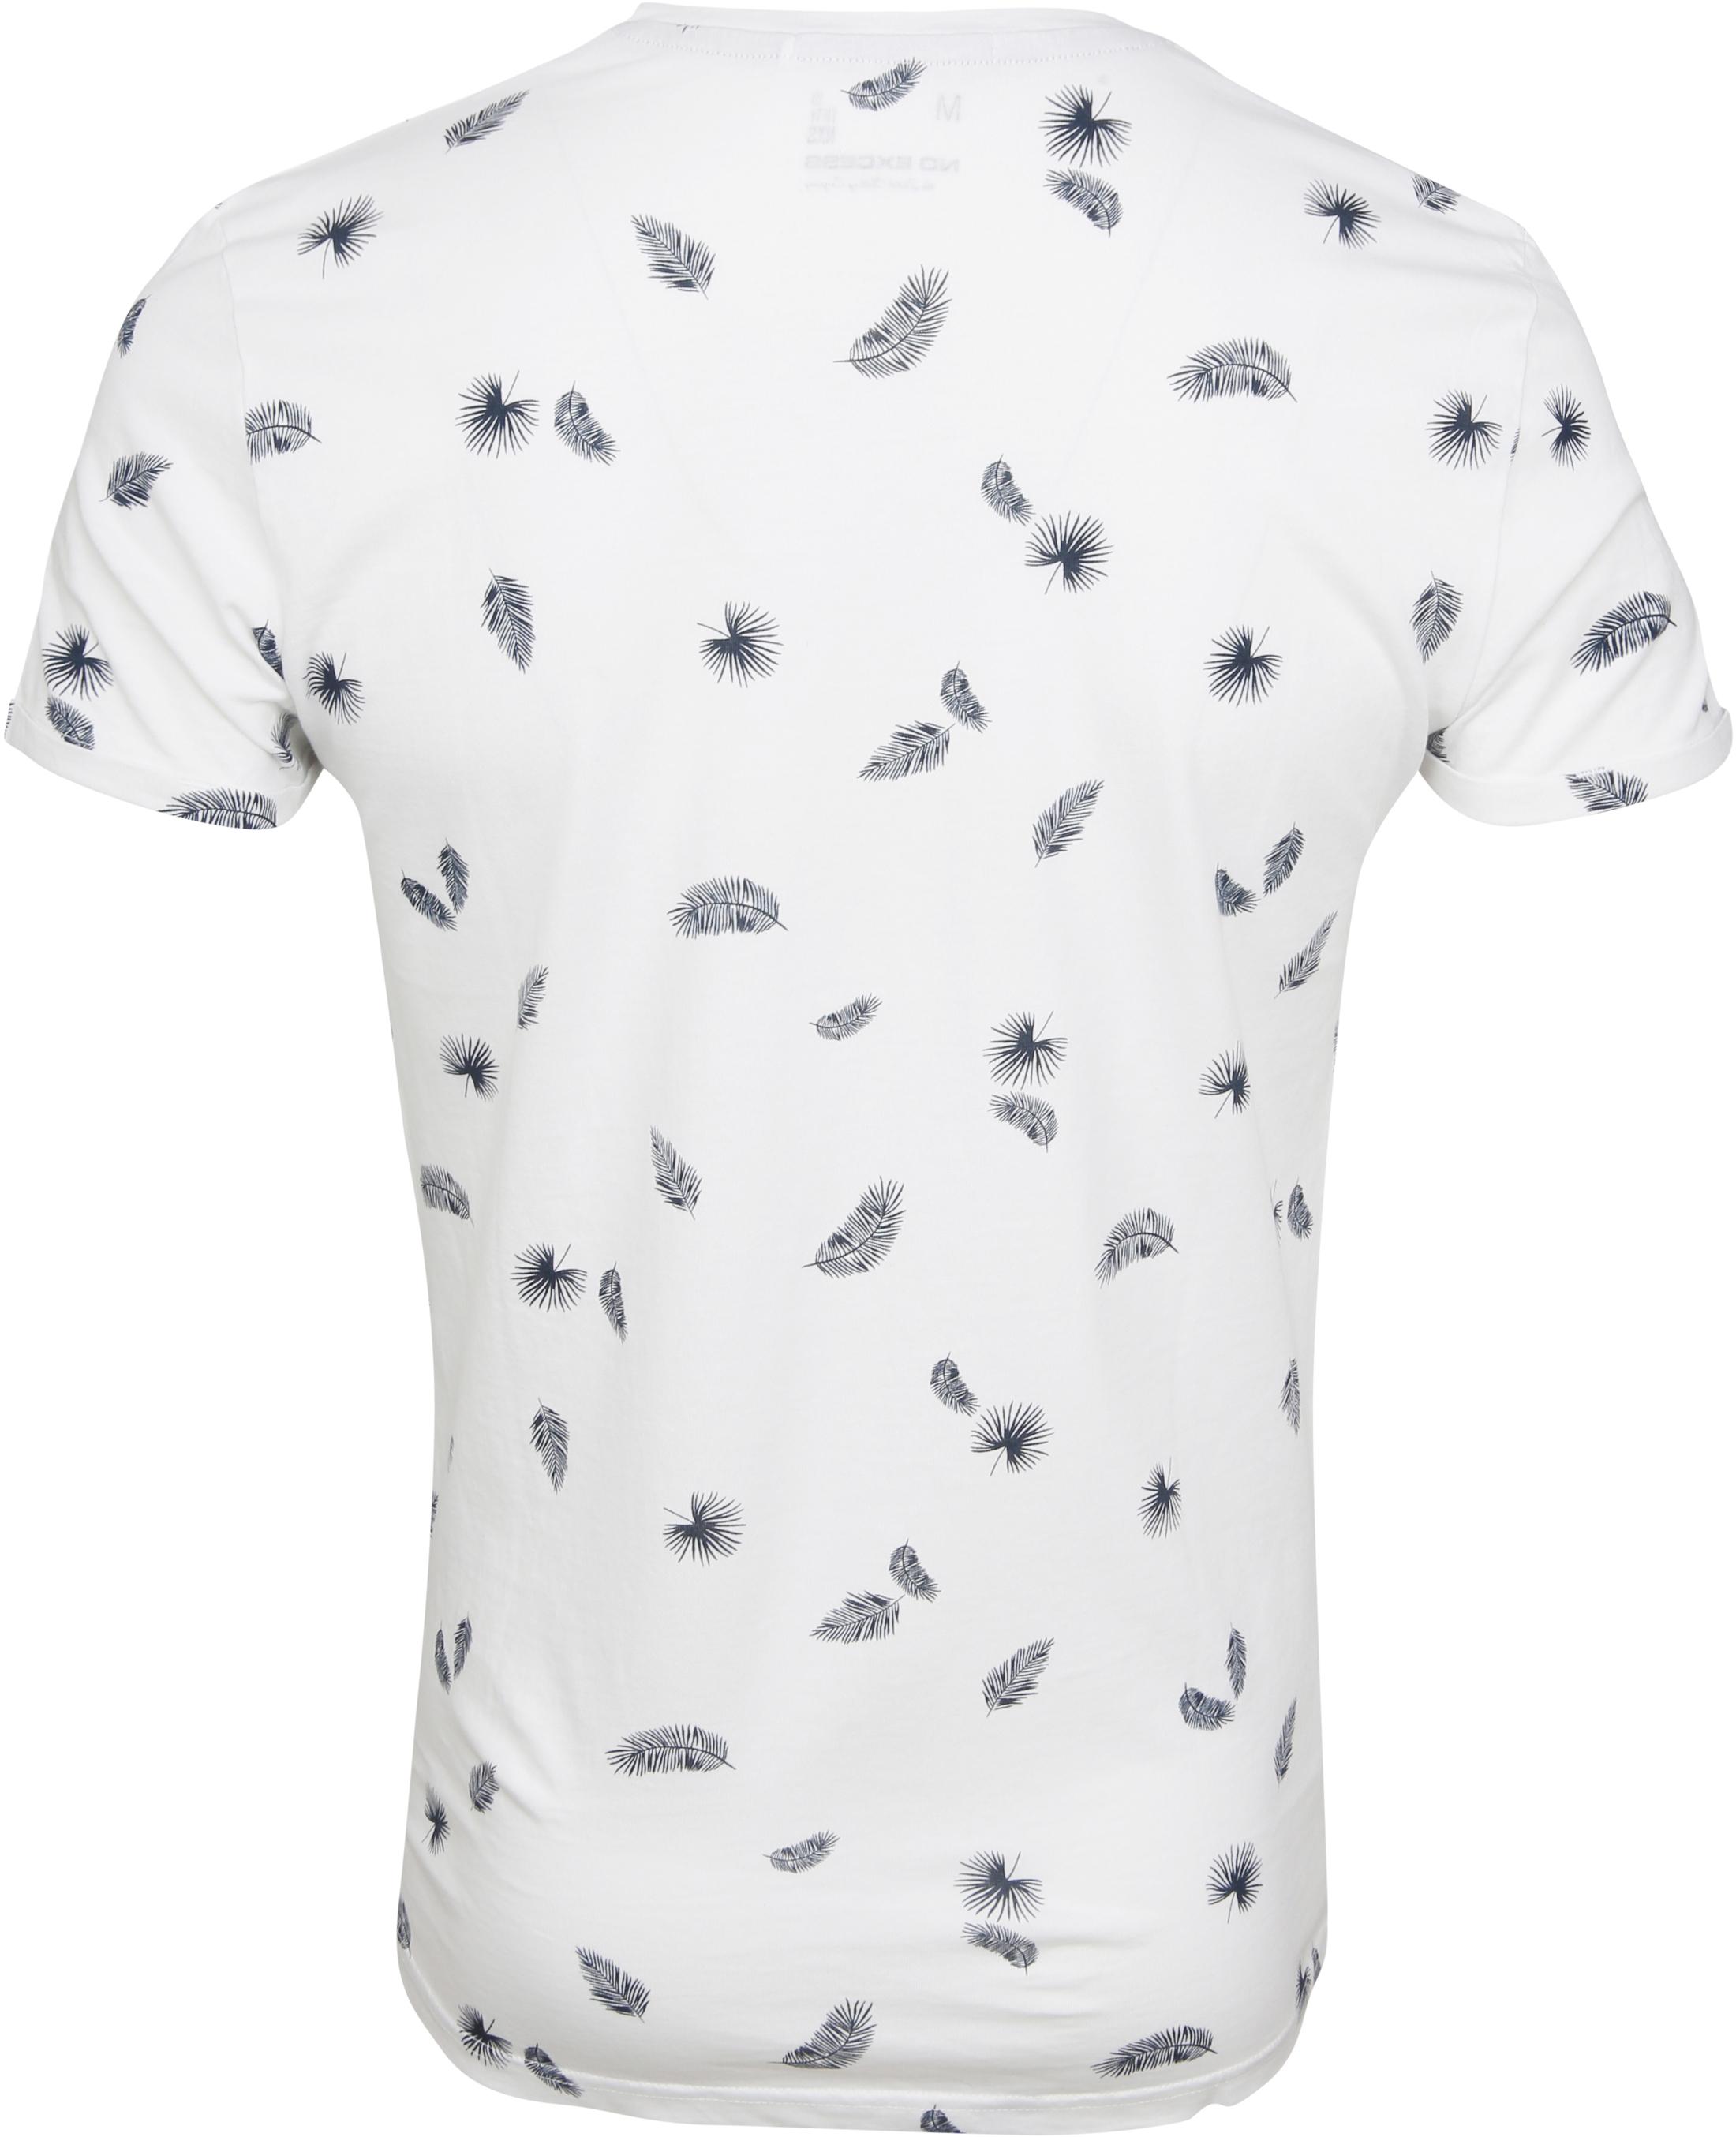 No-Excess T-shirt Palm Print White foto 2